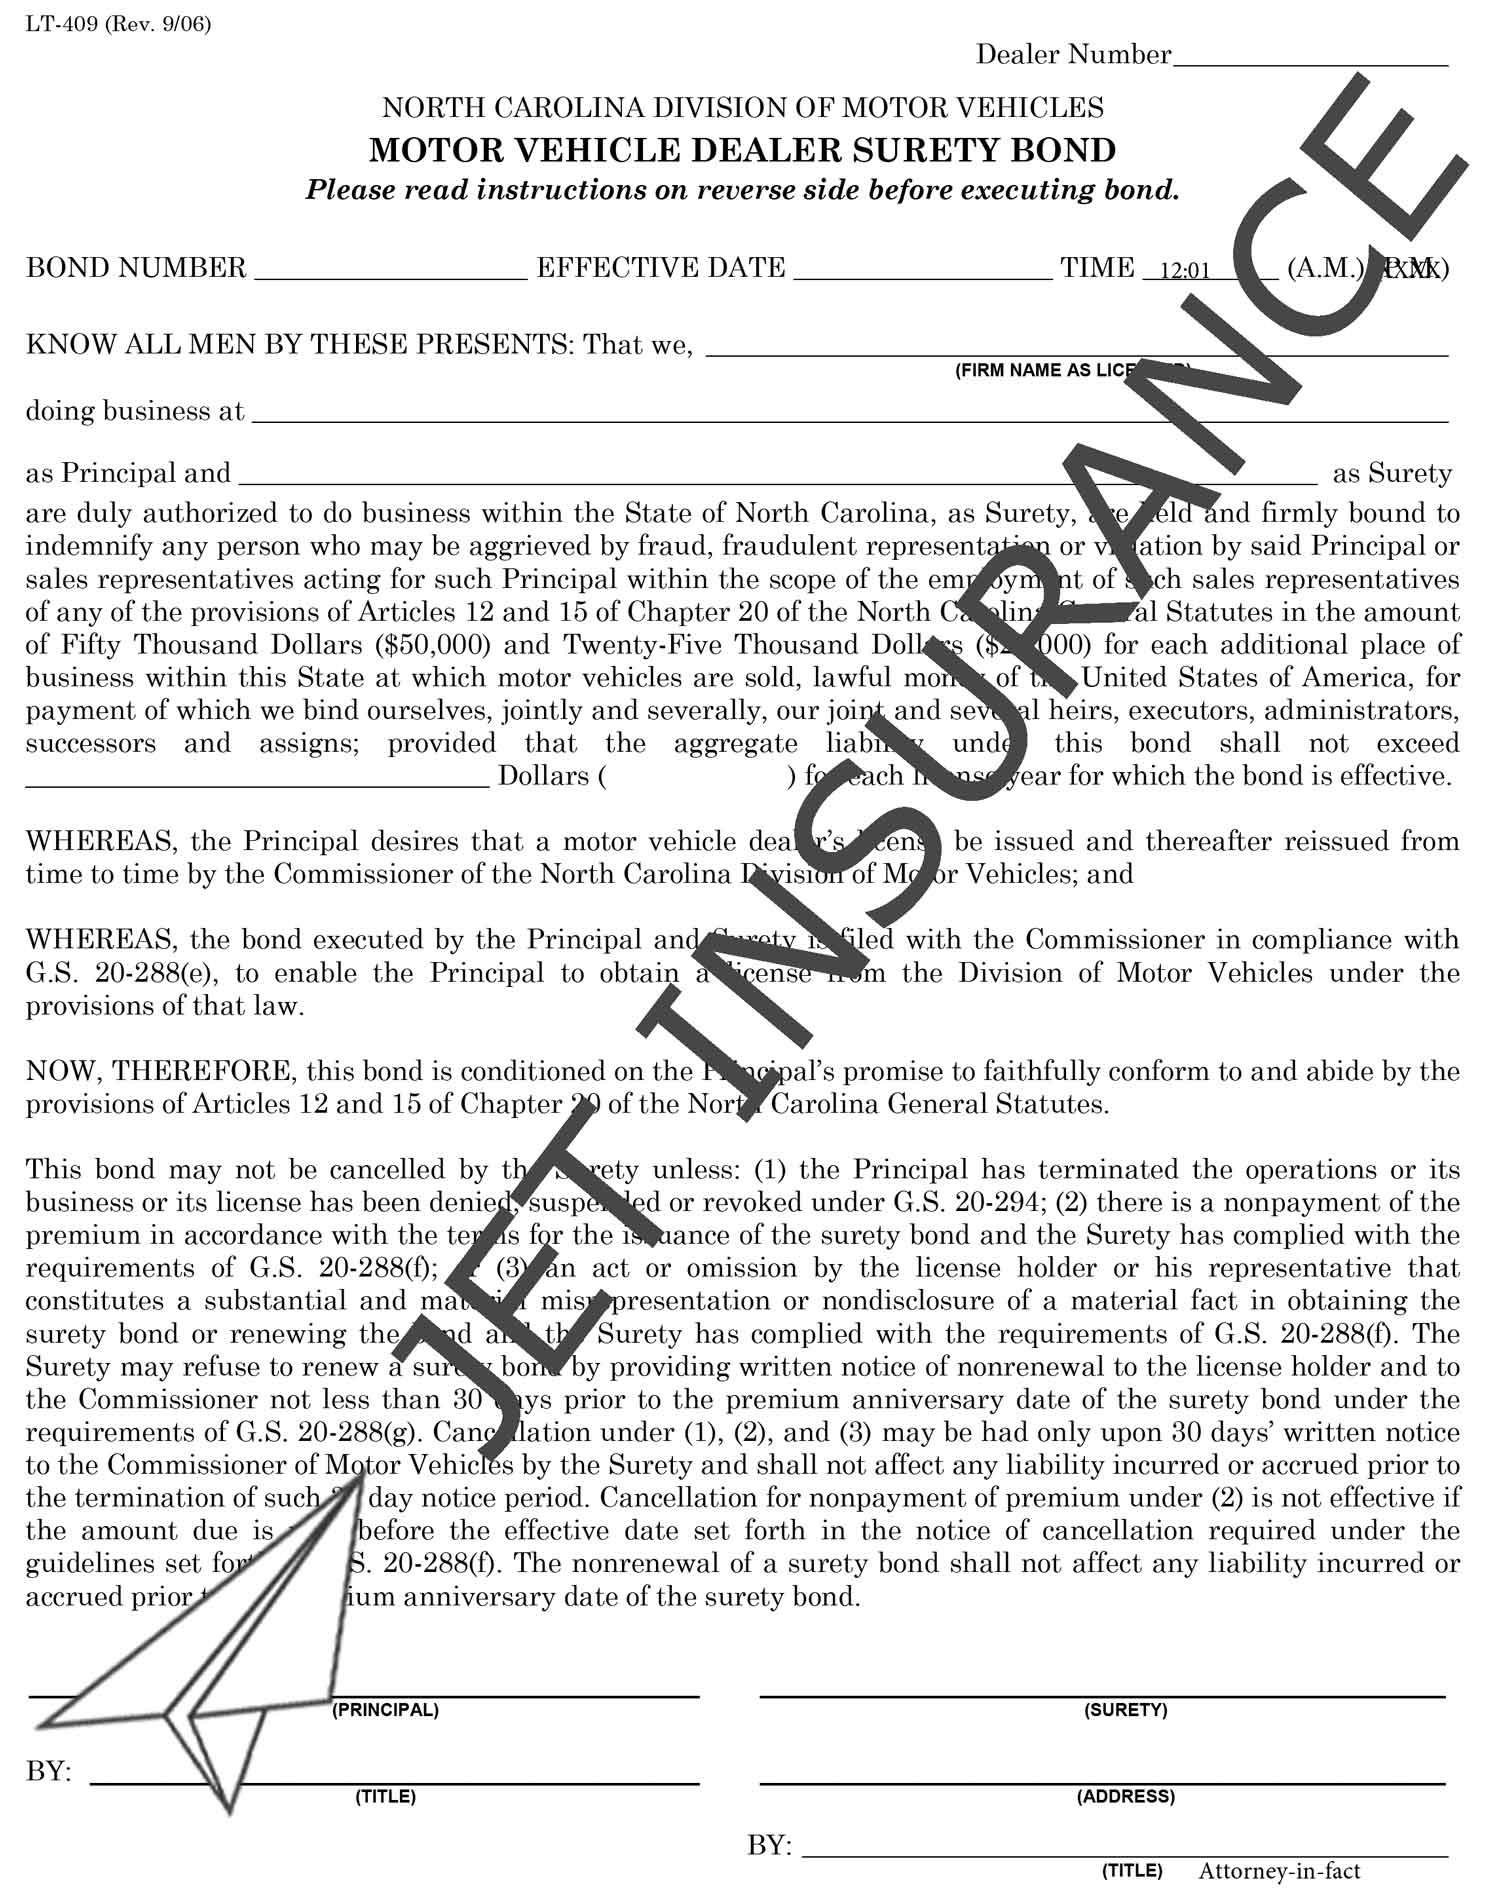 North Carolina Auto Dealer Bond Form